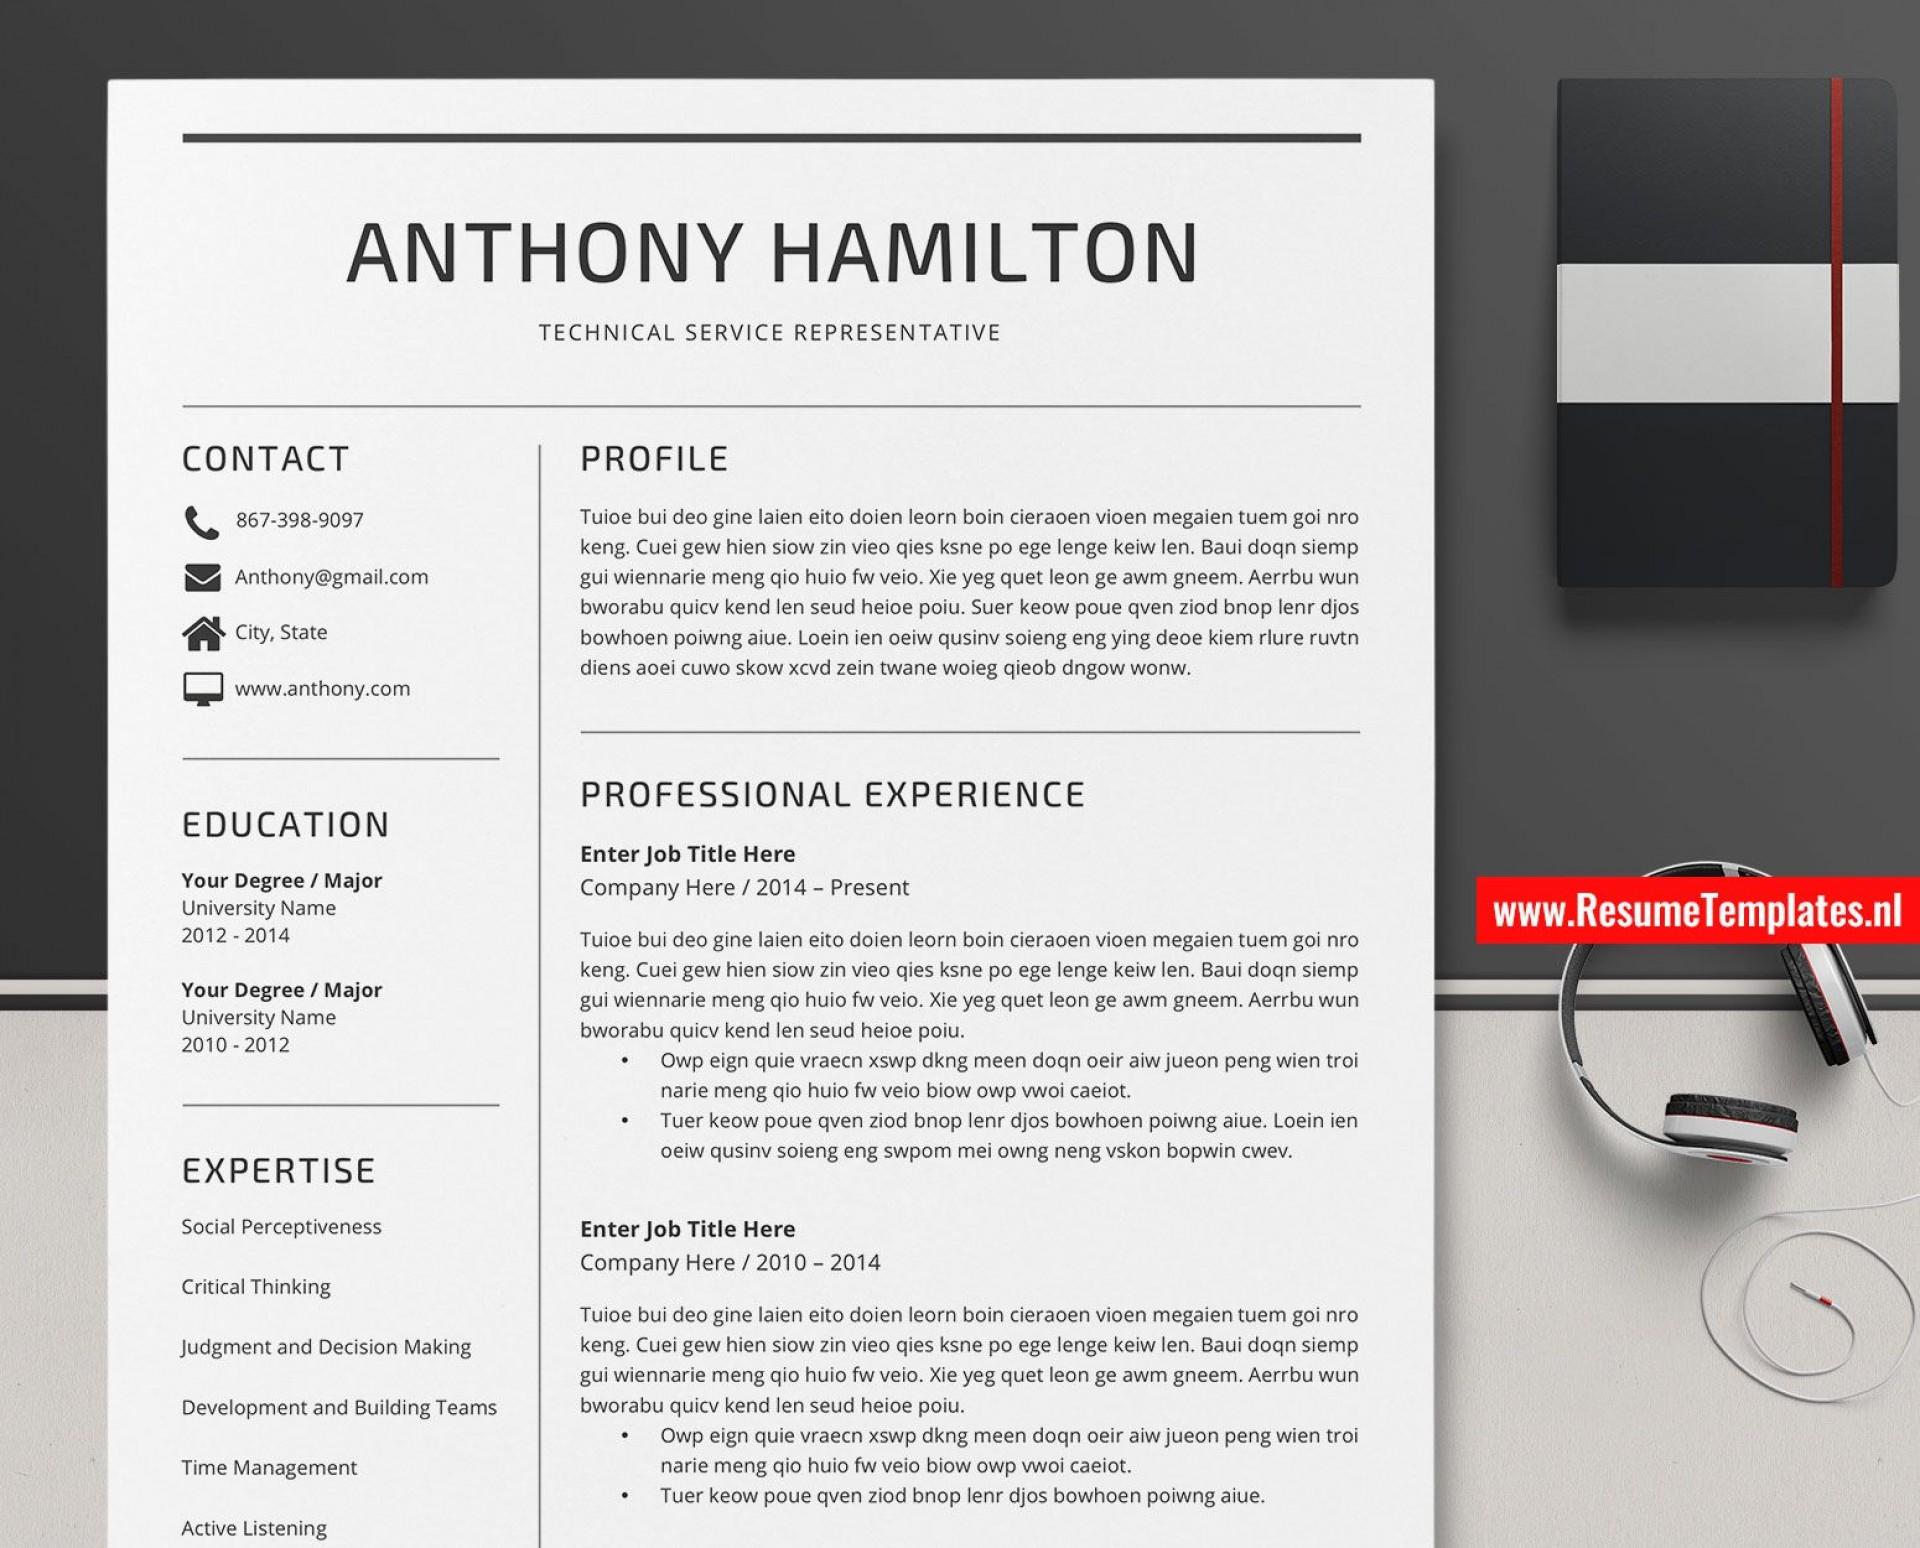 010 Top Word Resume Template Mac Image  2008 Microsoft 20111920